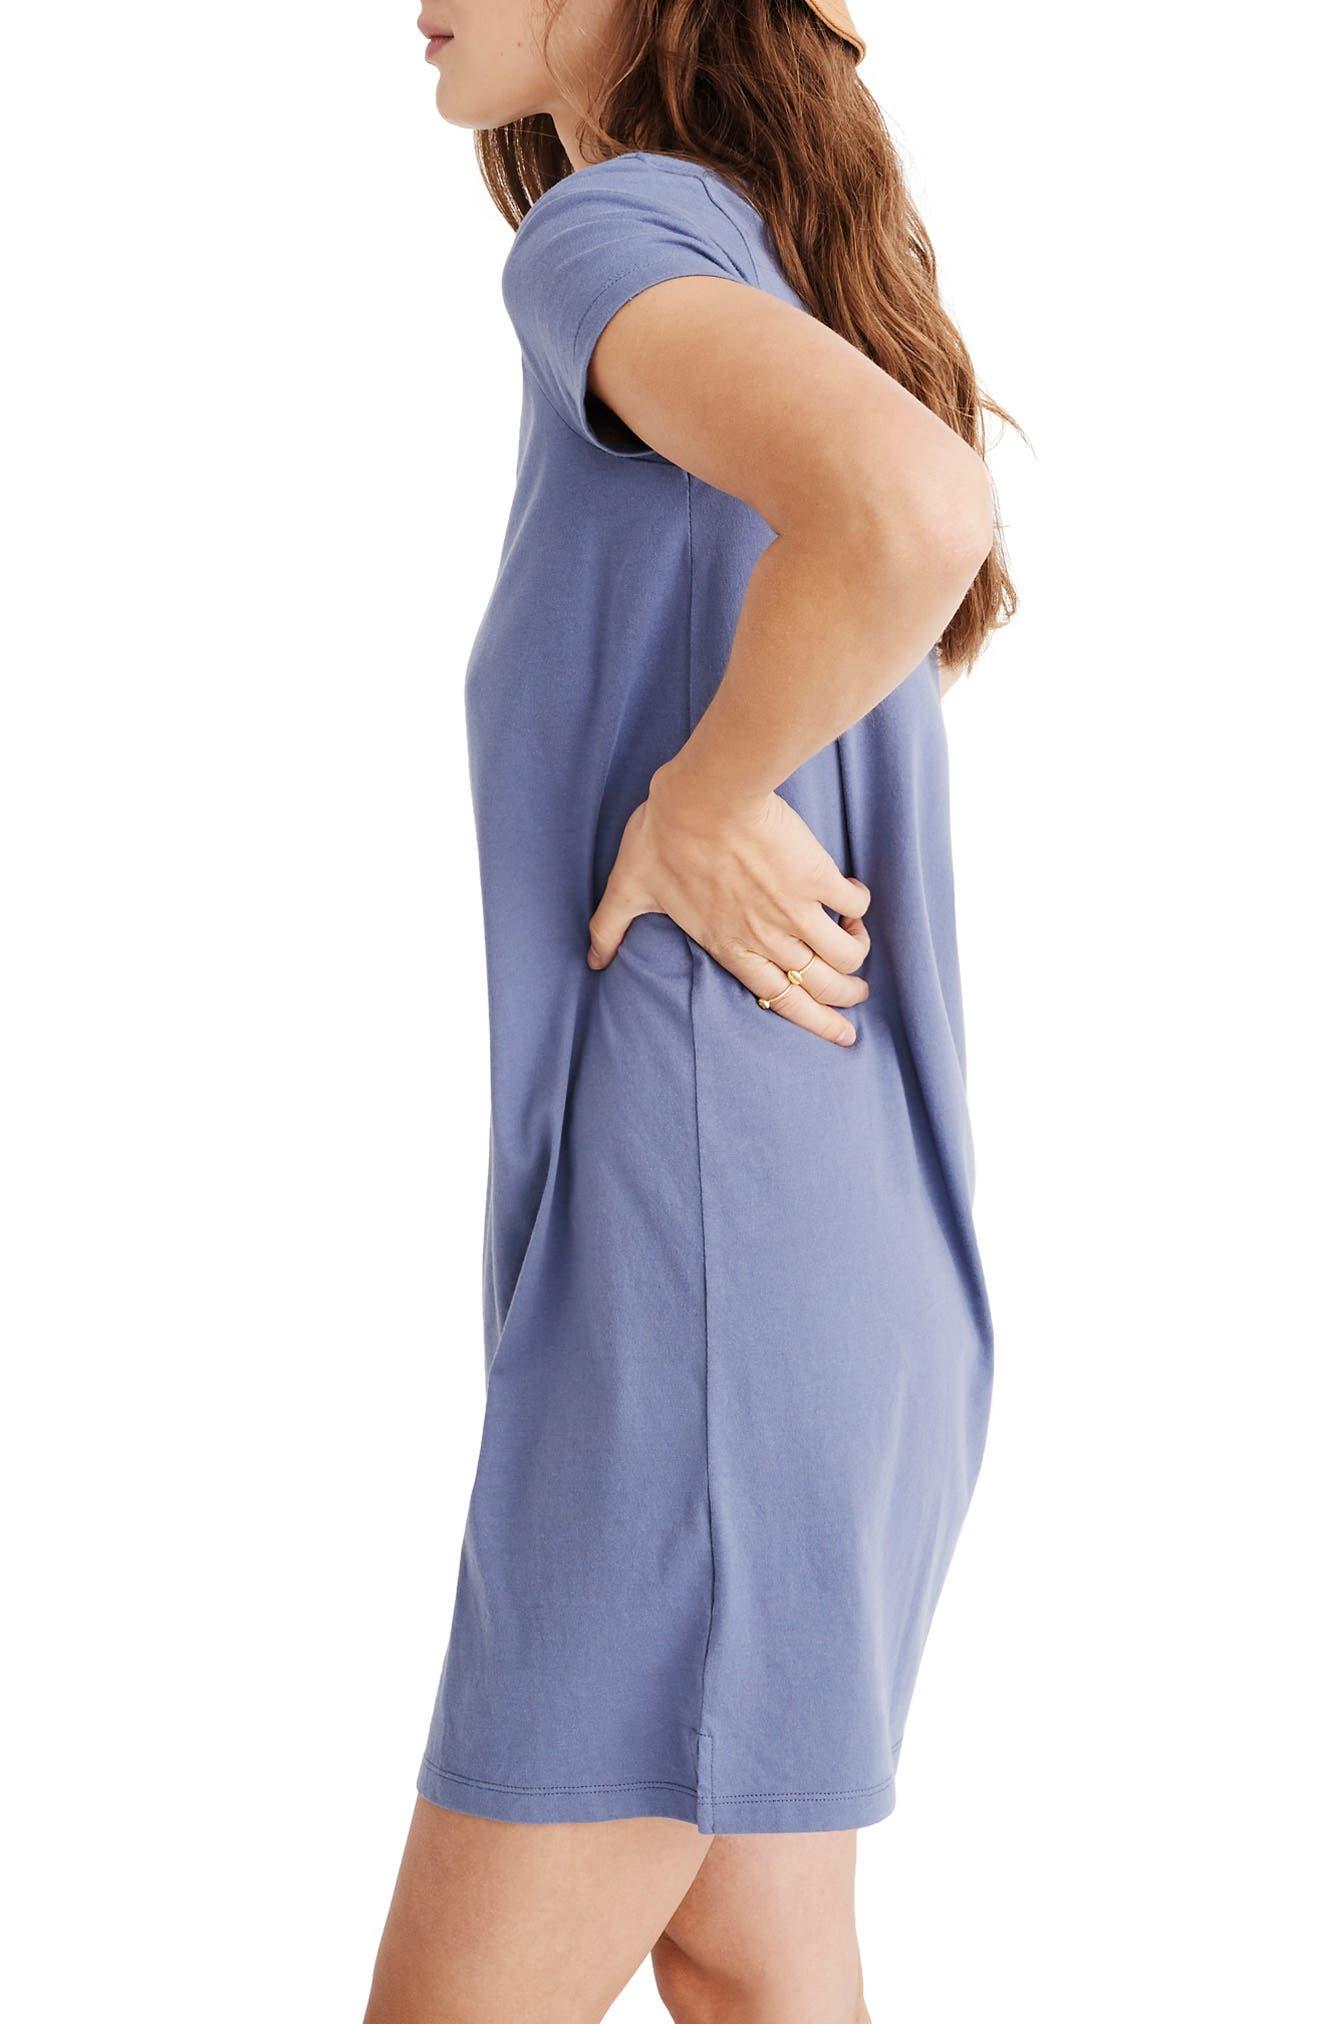 MADEWELL, Northside V-Neck T-Shirt Dress, Alternate thumbnail 3, color, PALE SHADOW